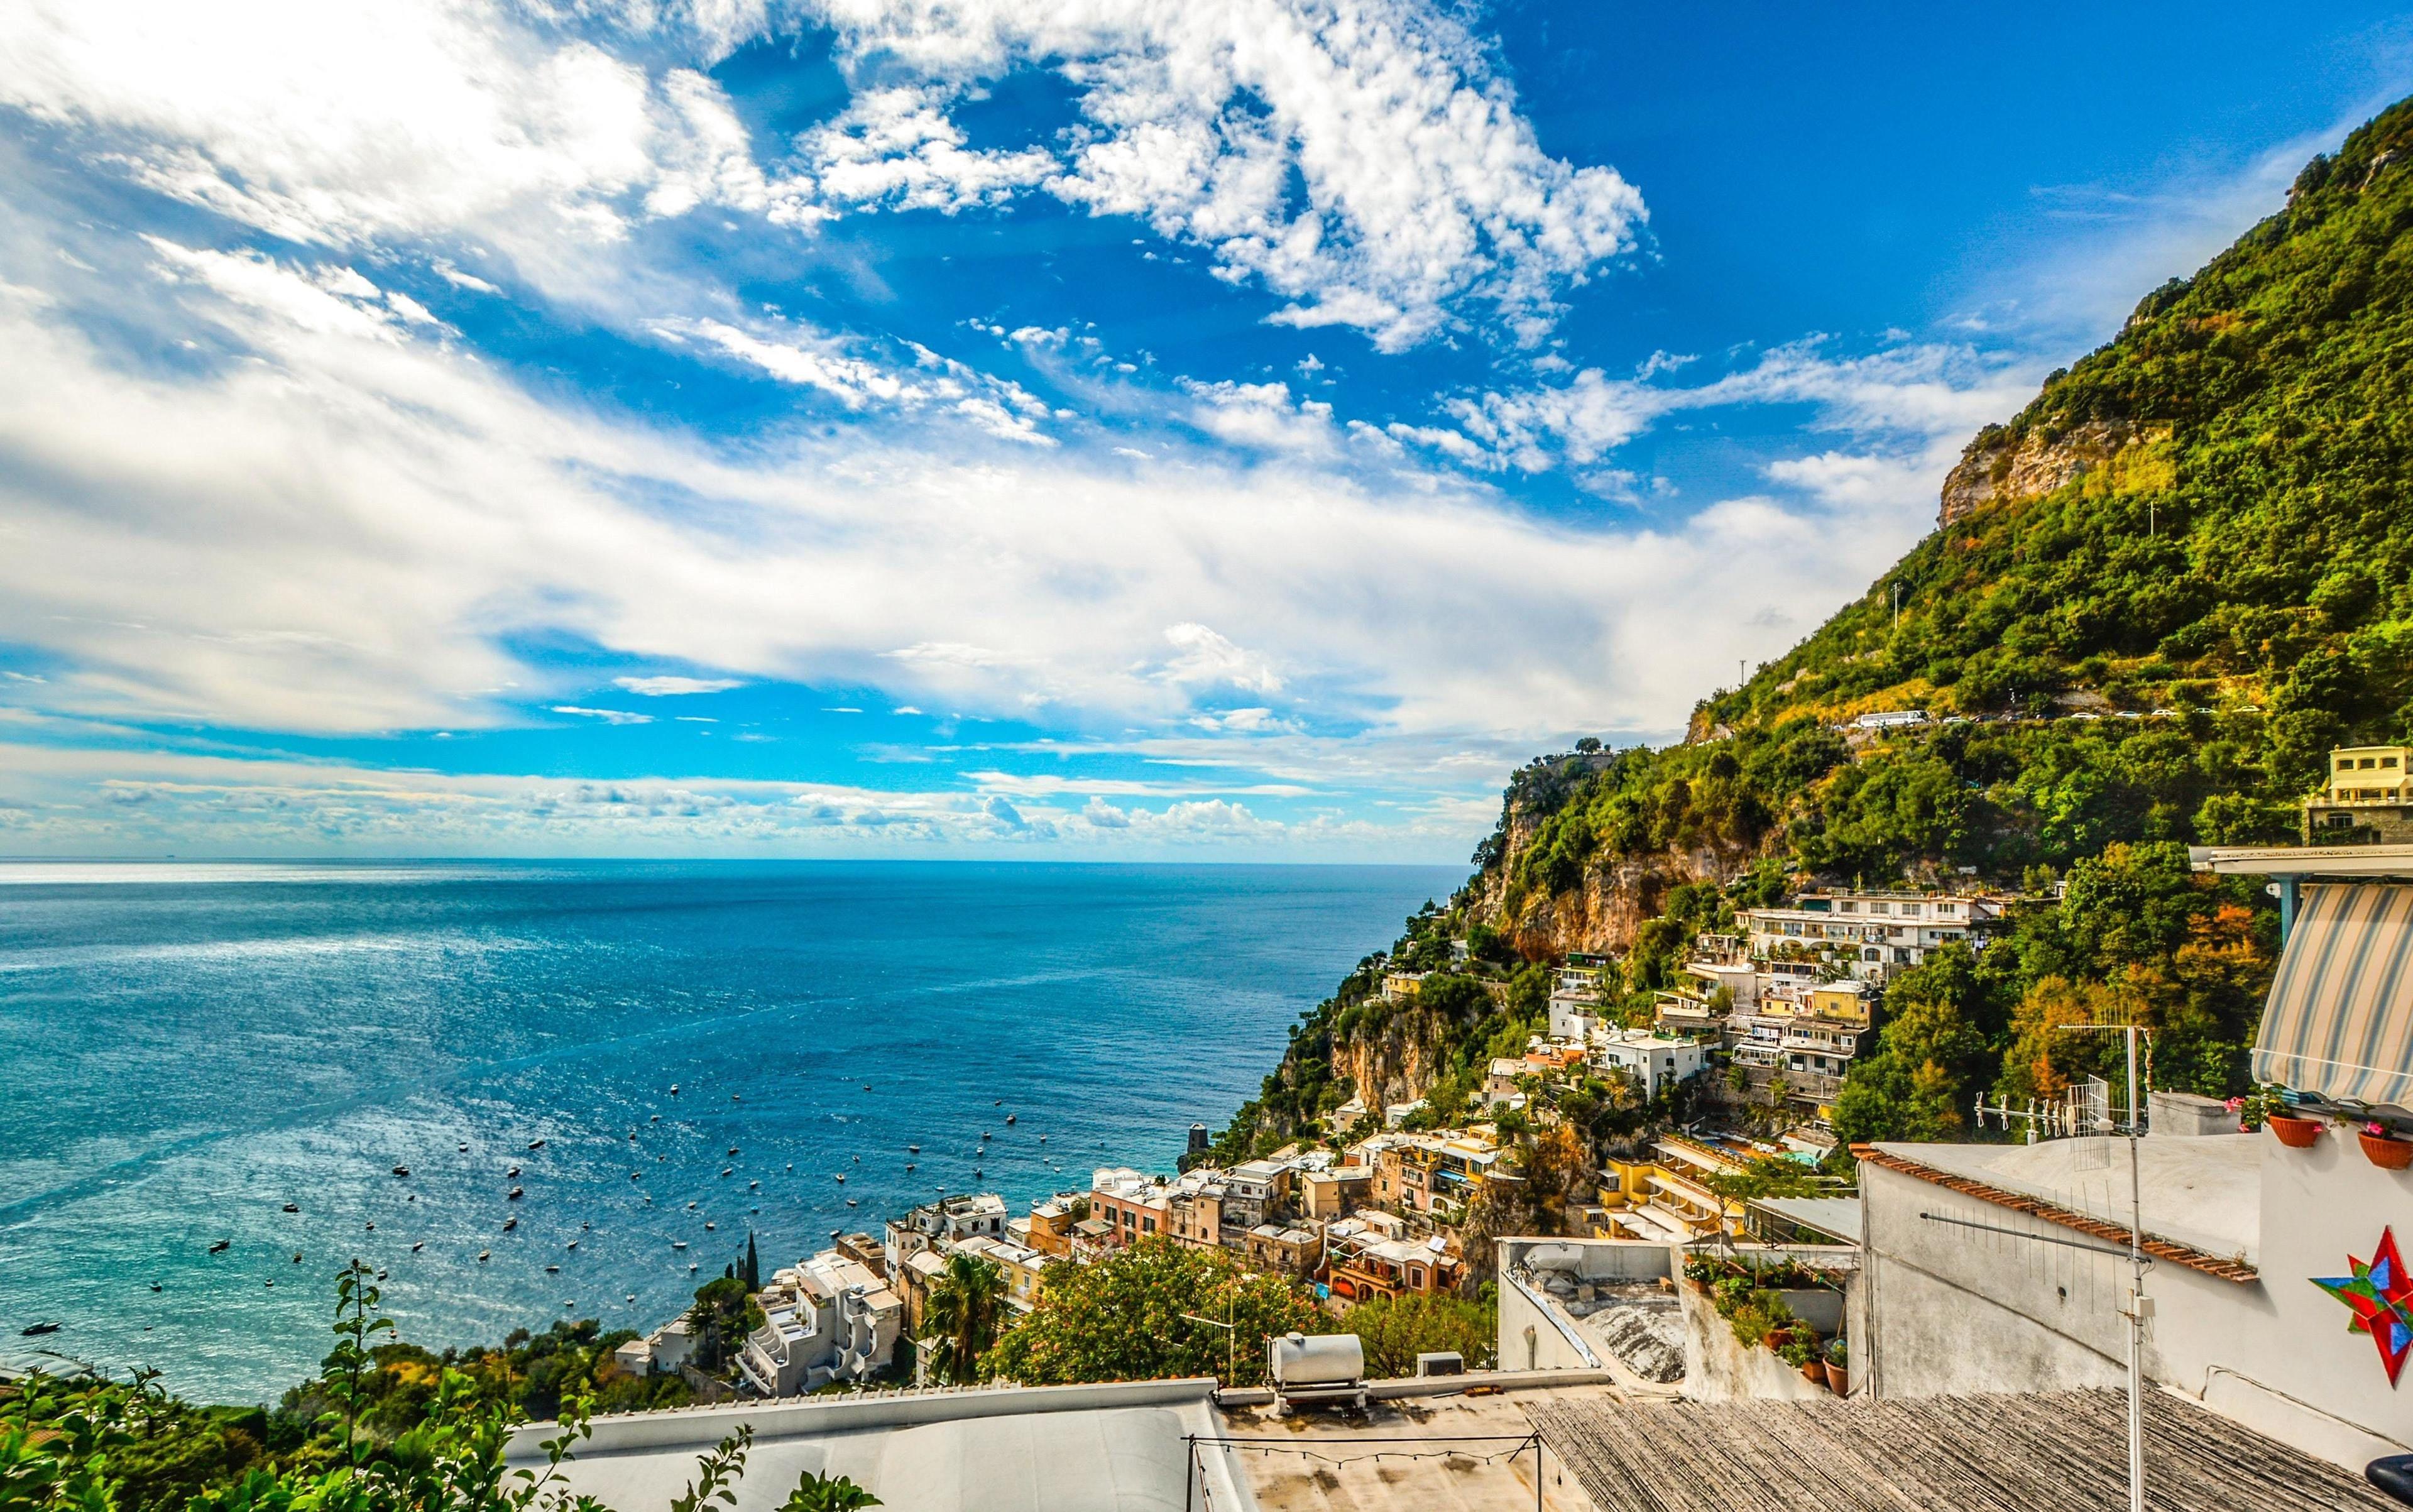 Sorrento, Positano and Amalfi - Day Trip from Naples